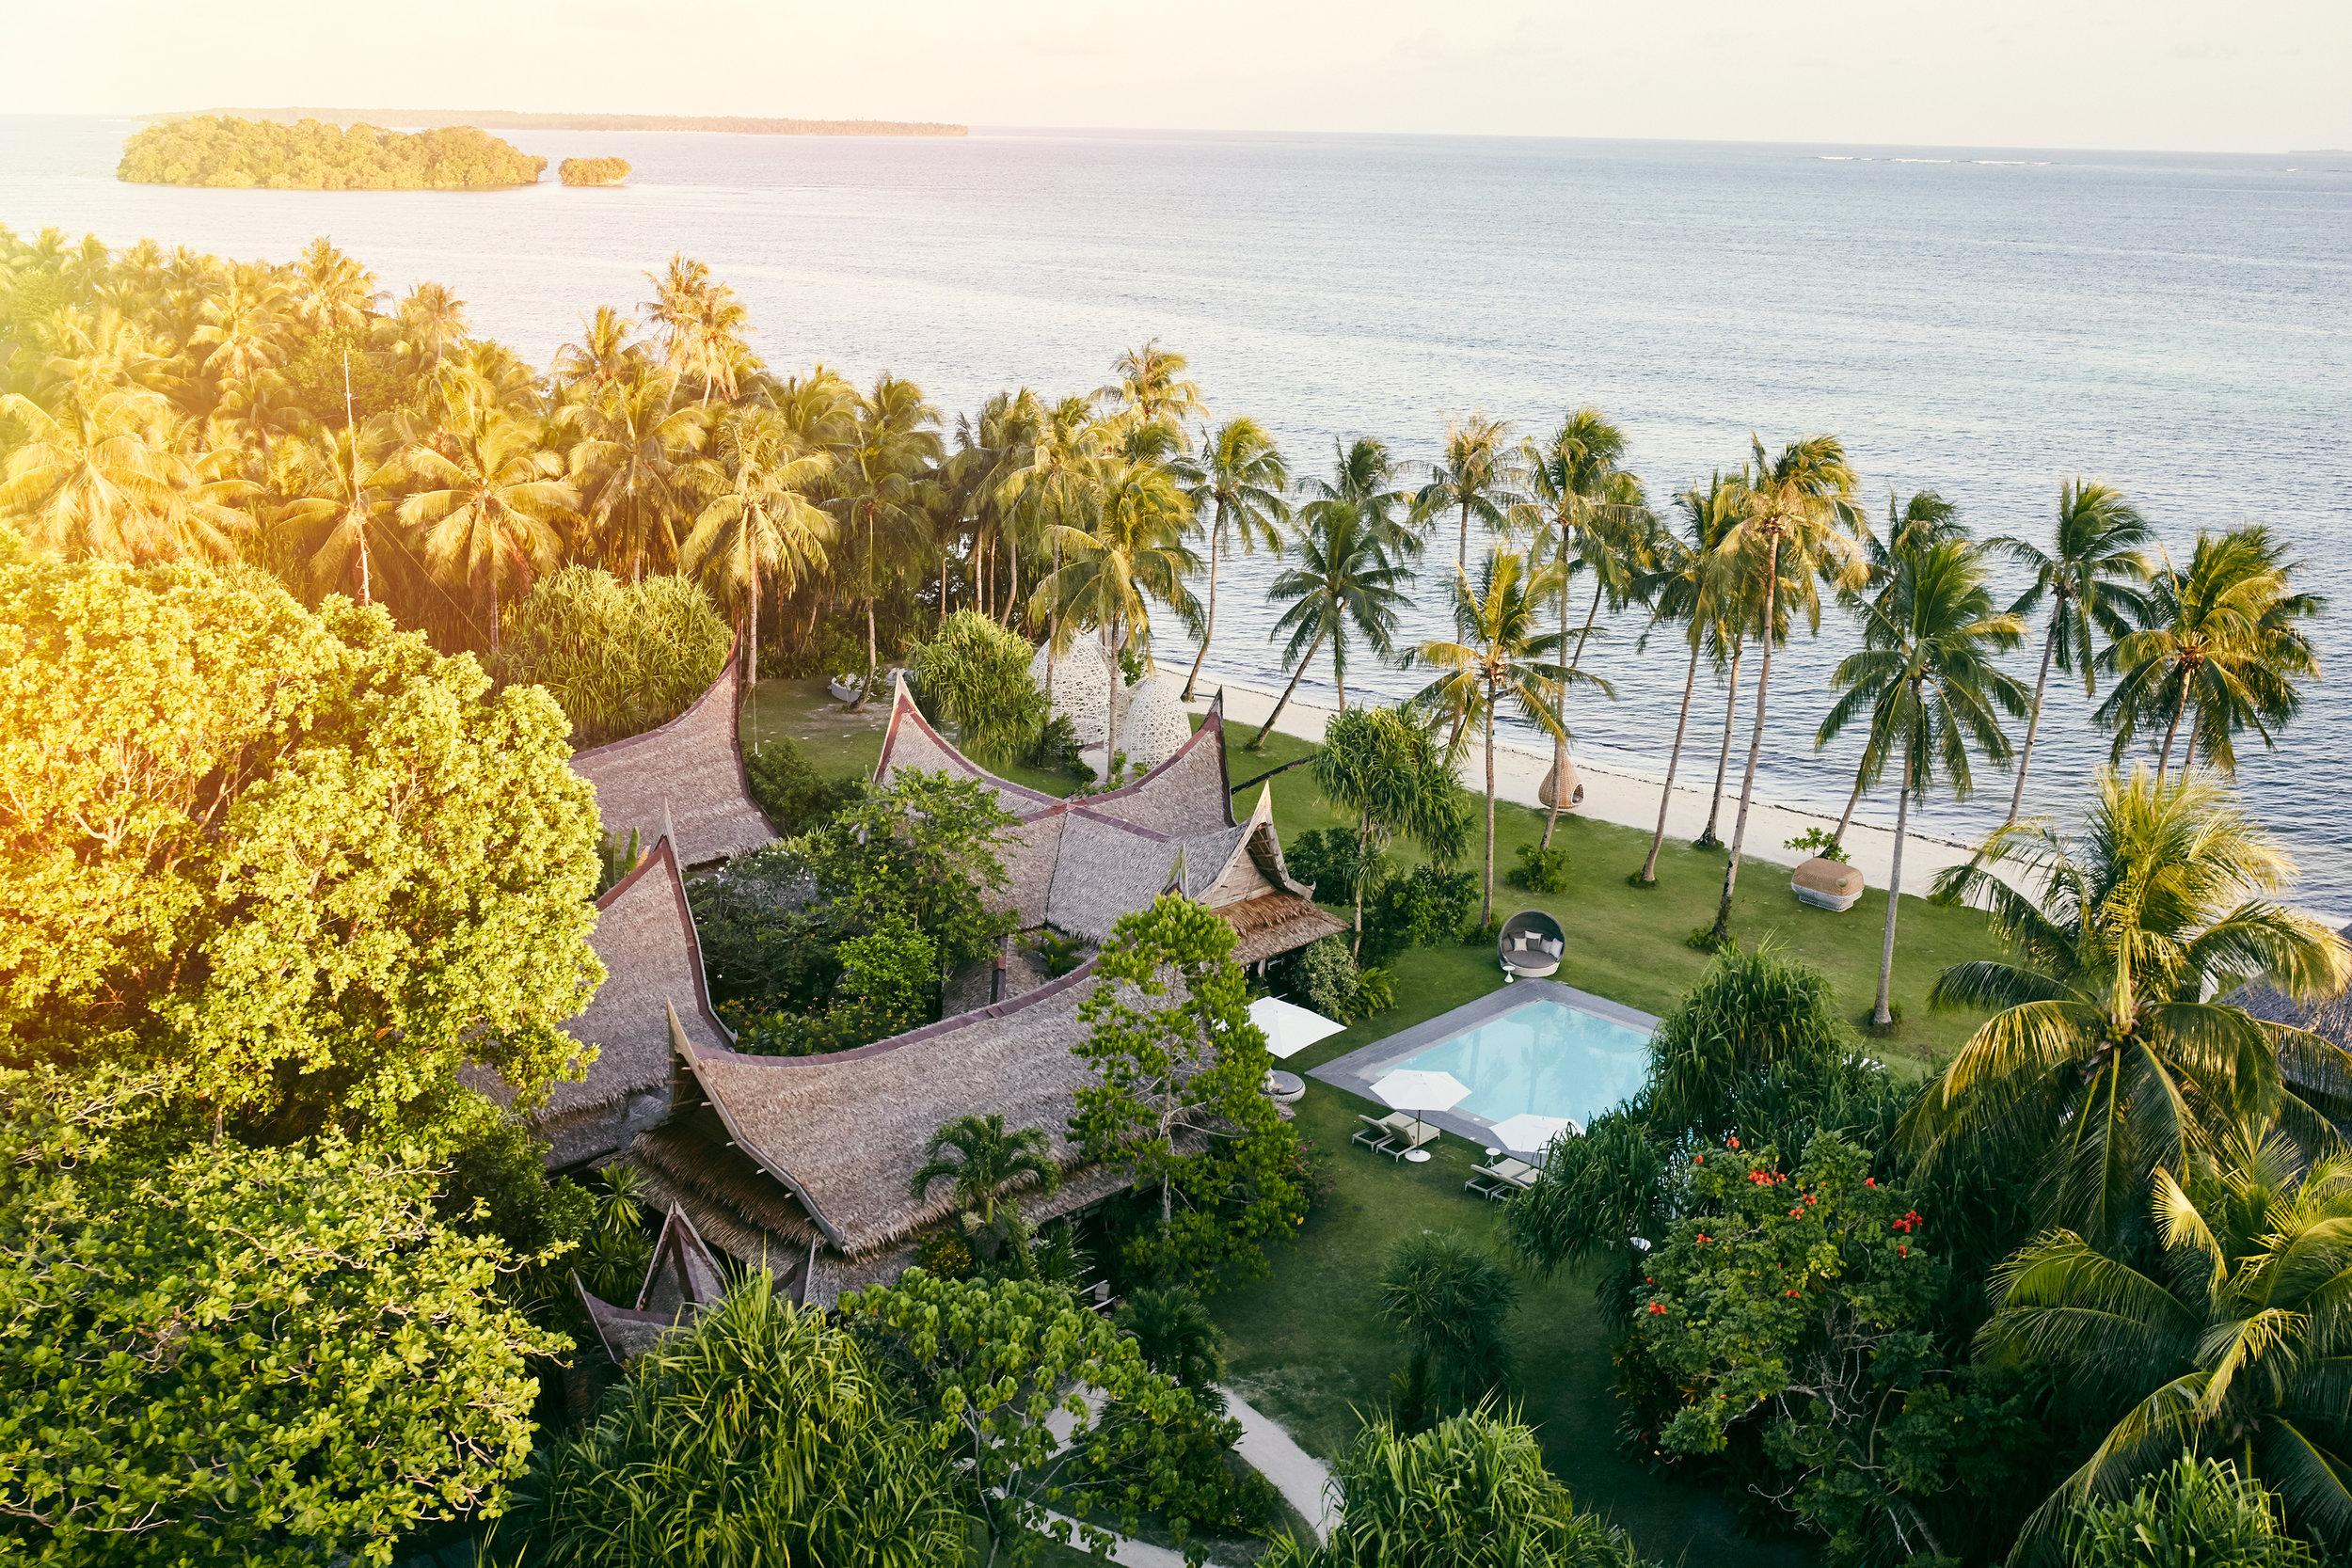 Dedon Island Resort_Local Hotel Hero_Mr & Mrs Smith Hotel Awards 2018 (4).jpg